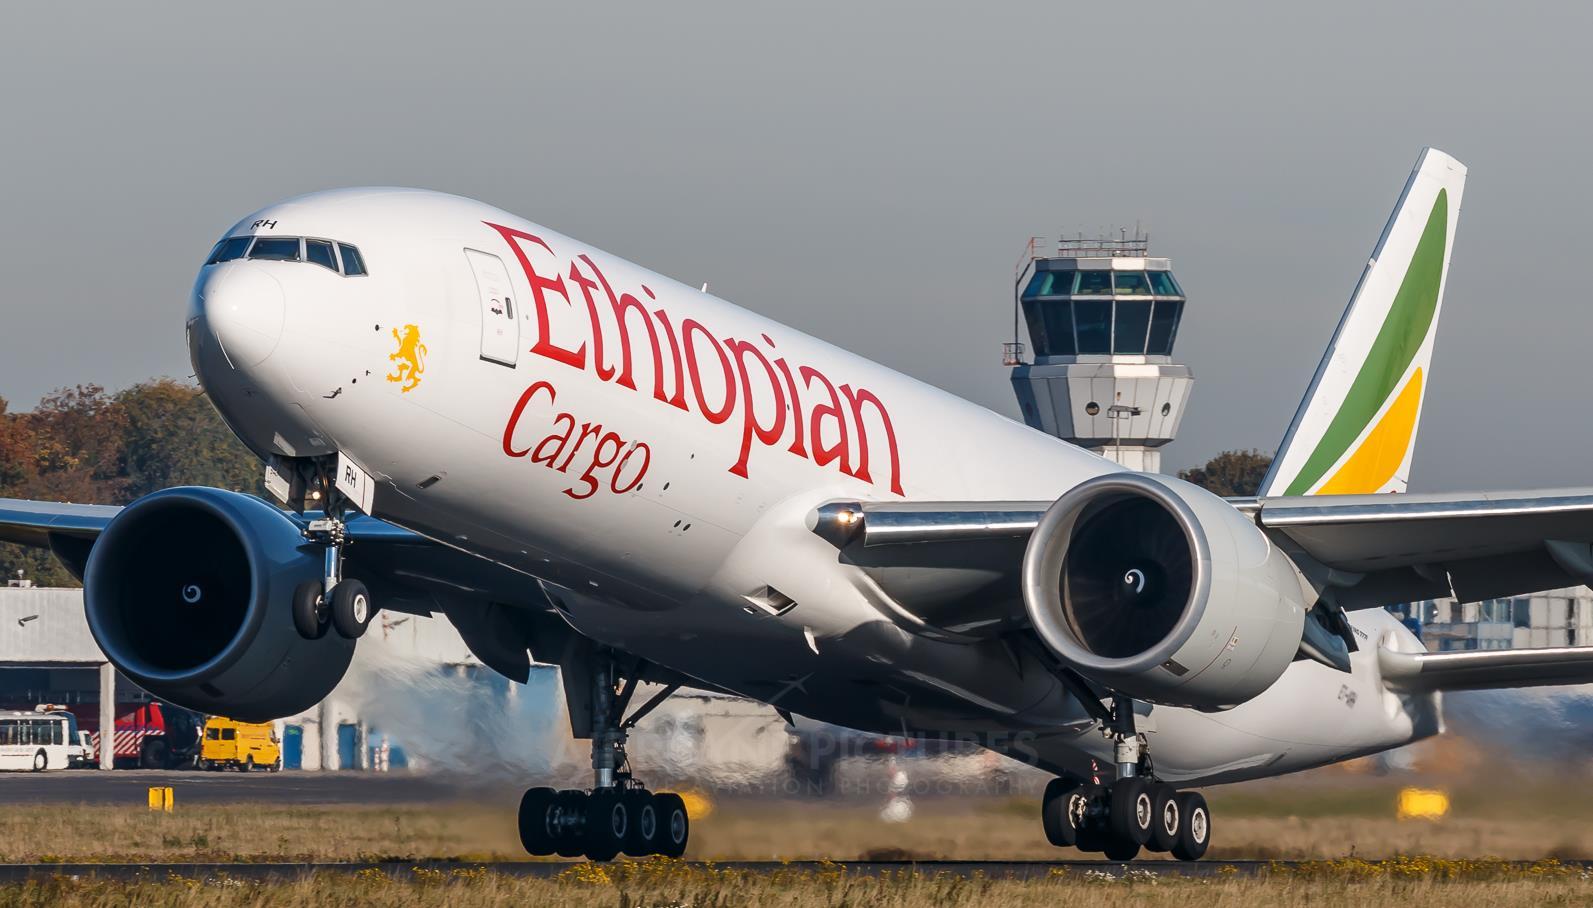 Ethiopias airline and airports merge to form single aviation group ethiopias airline and airports merge to form single aviation group air cargo news altavistaventures Gallery